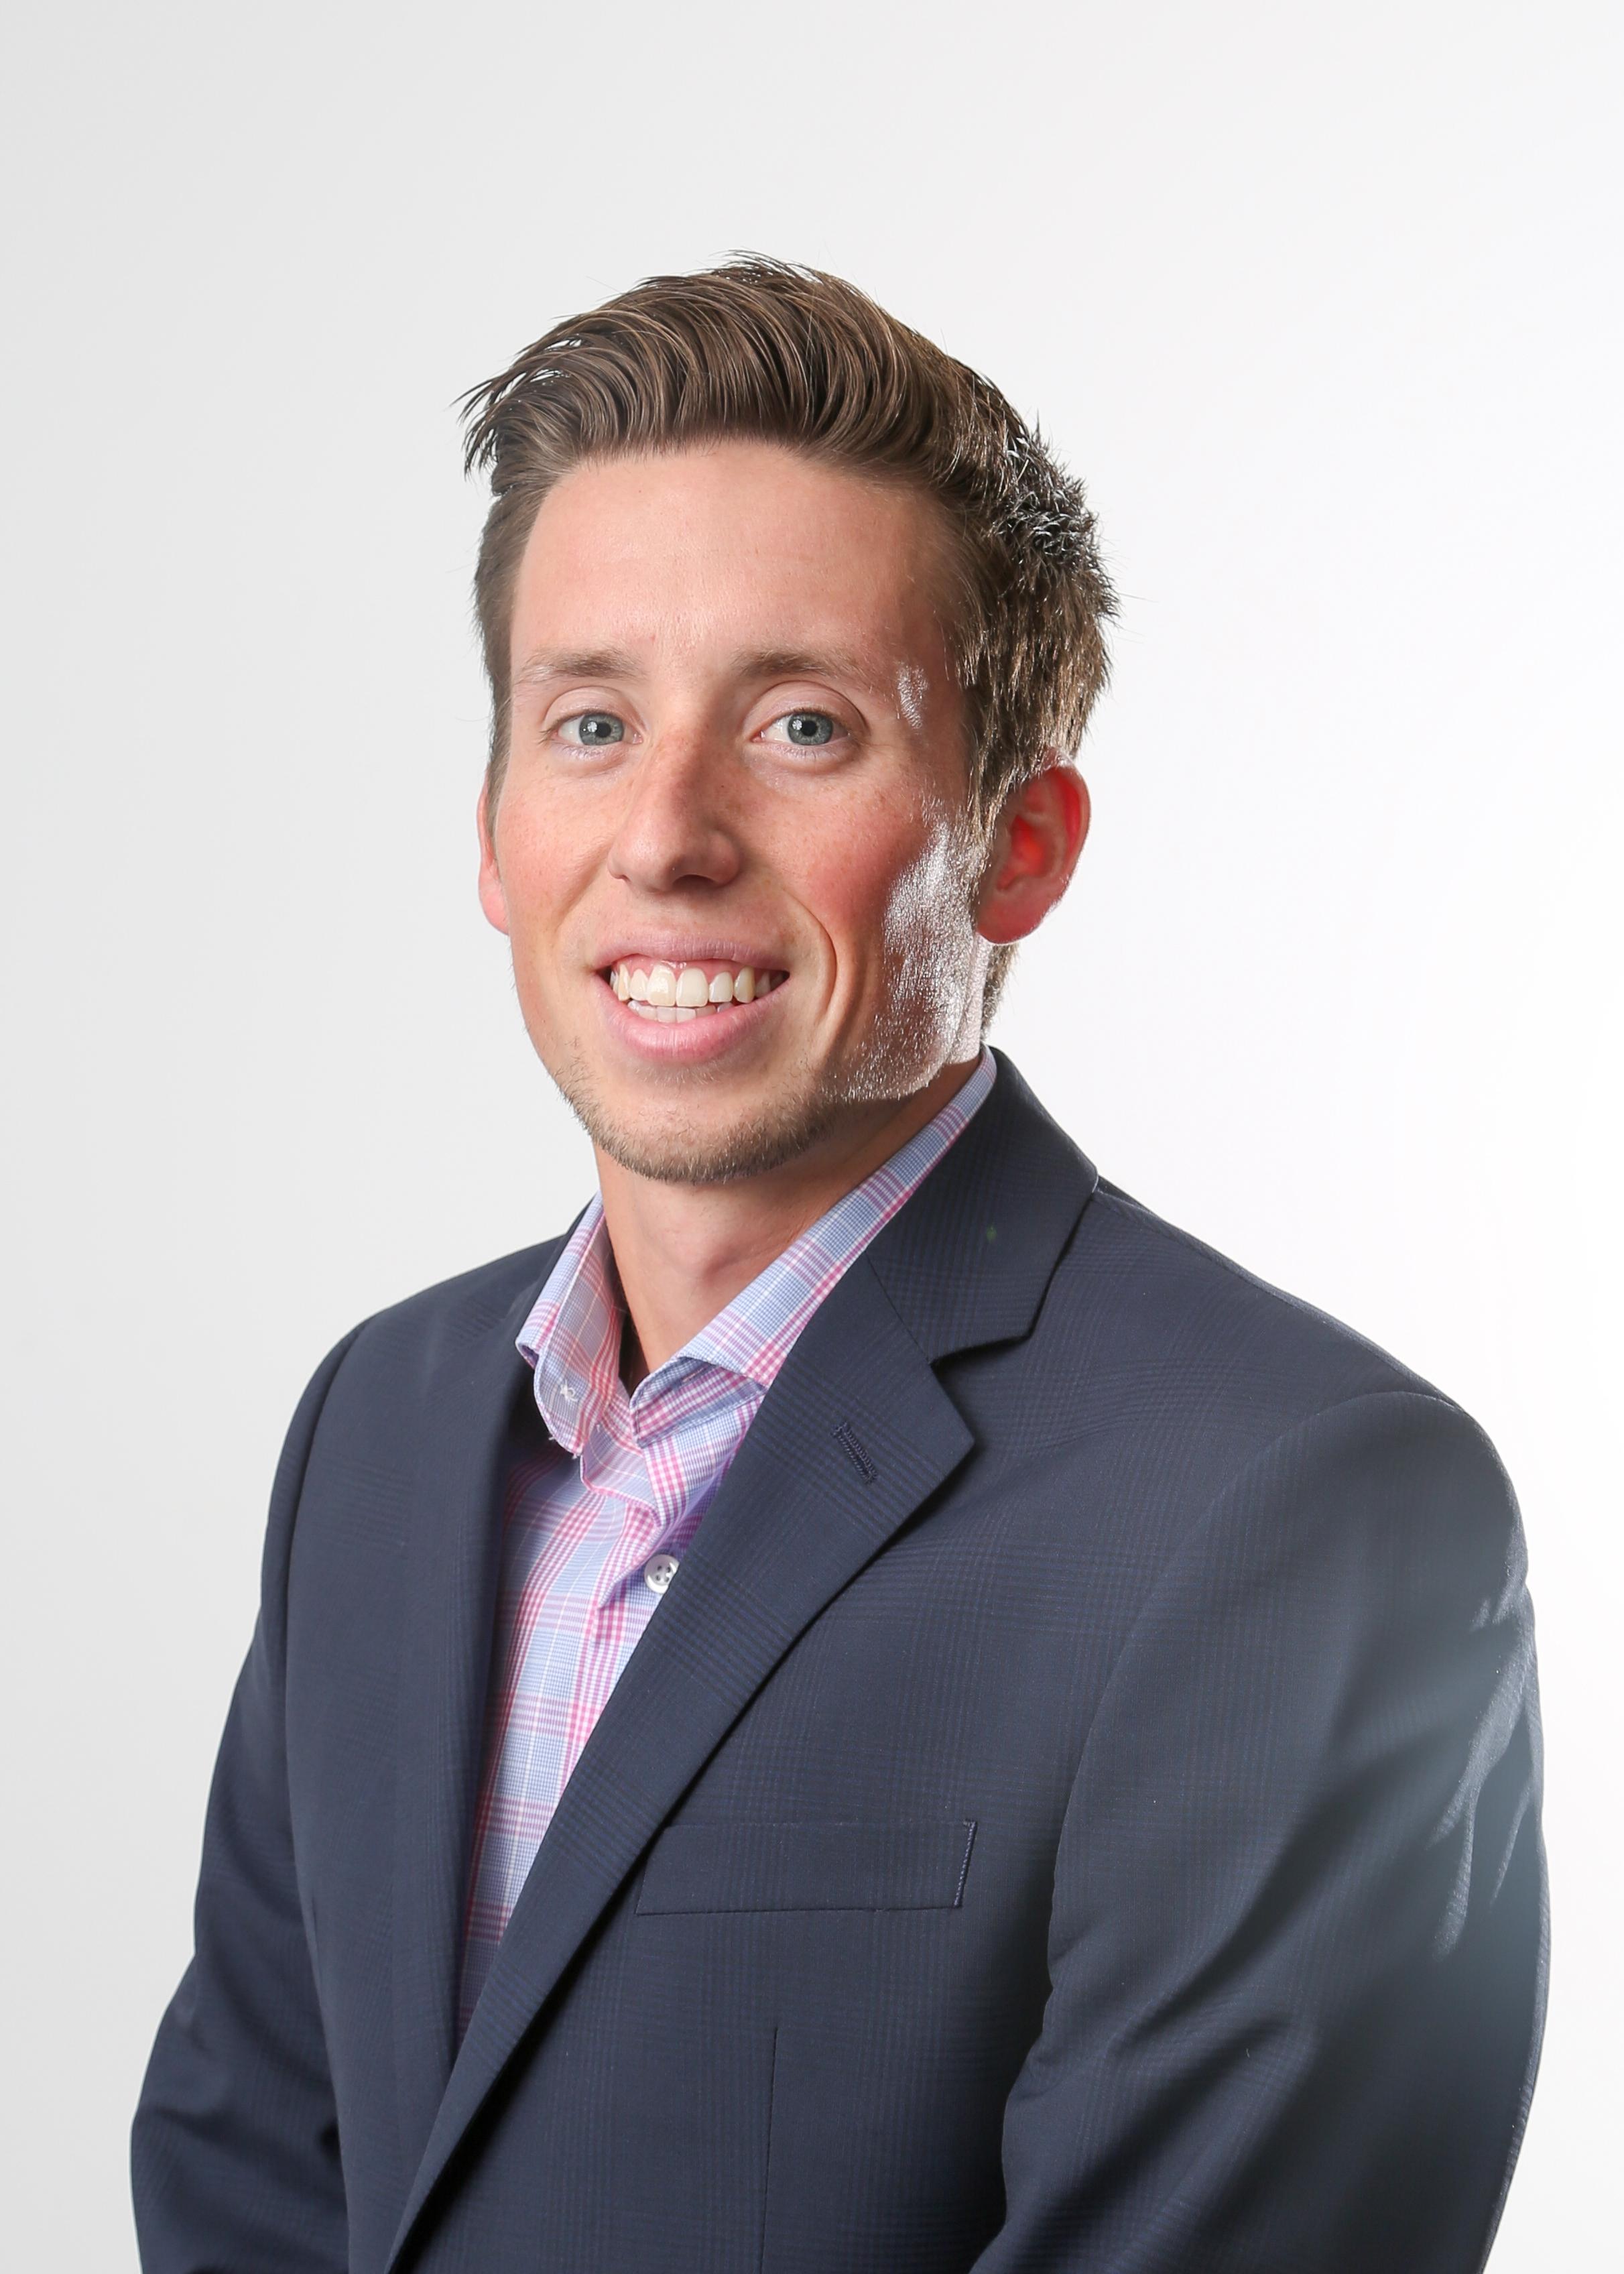 Dalton Moberly - Athletic Academic Coordinator